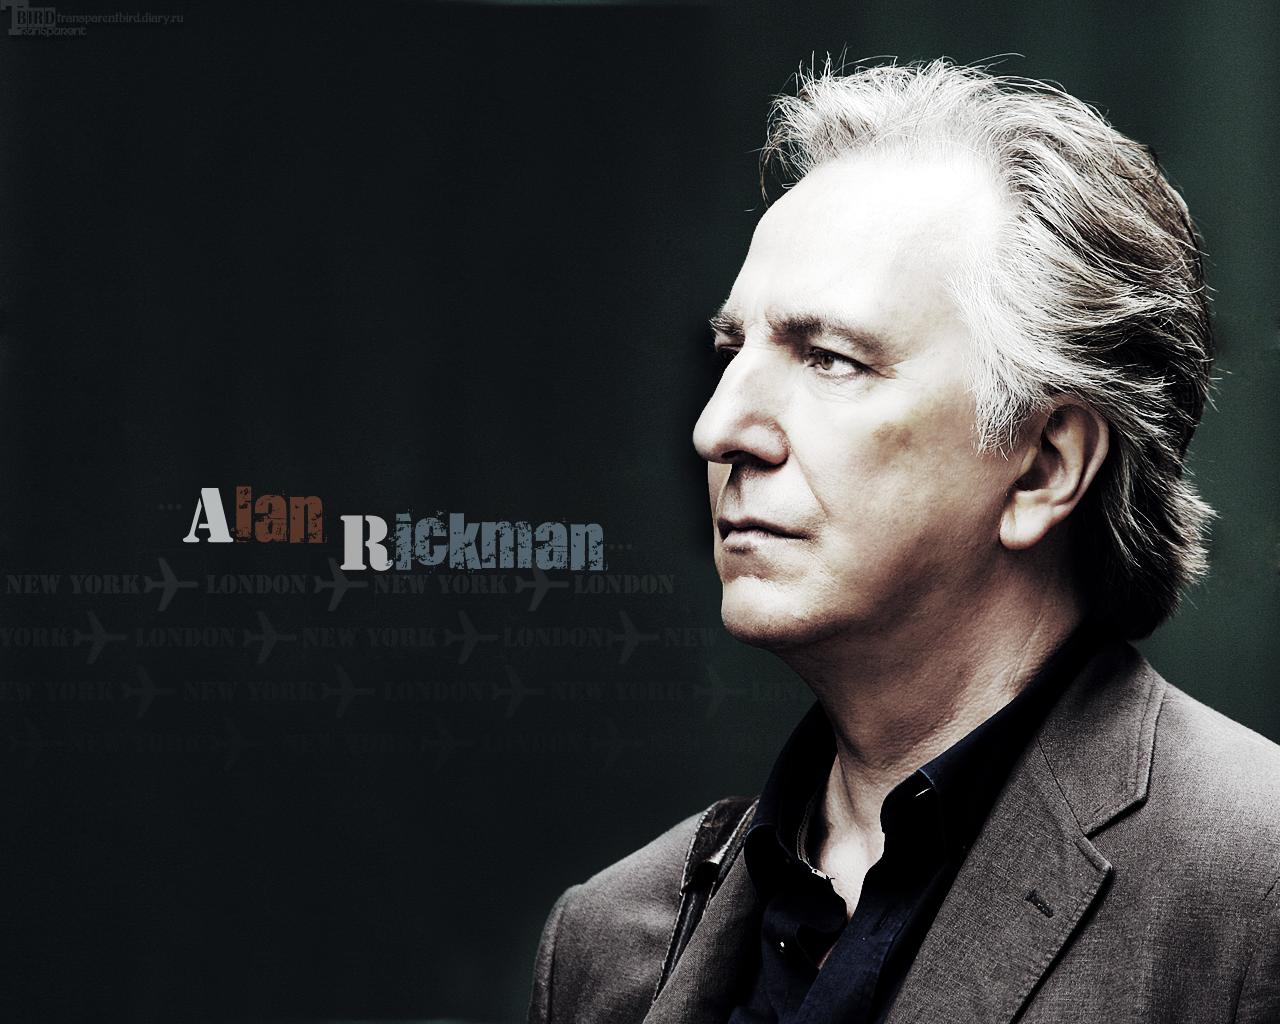 Alan Rickman - wallpaper 12 by transparentbird